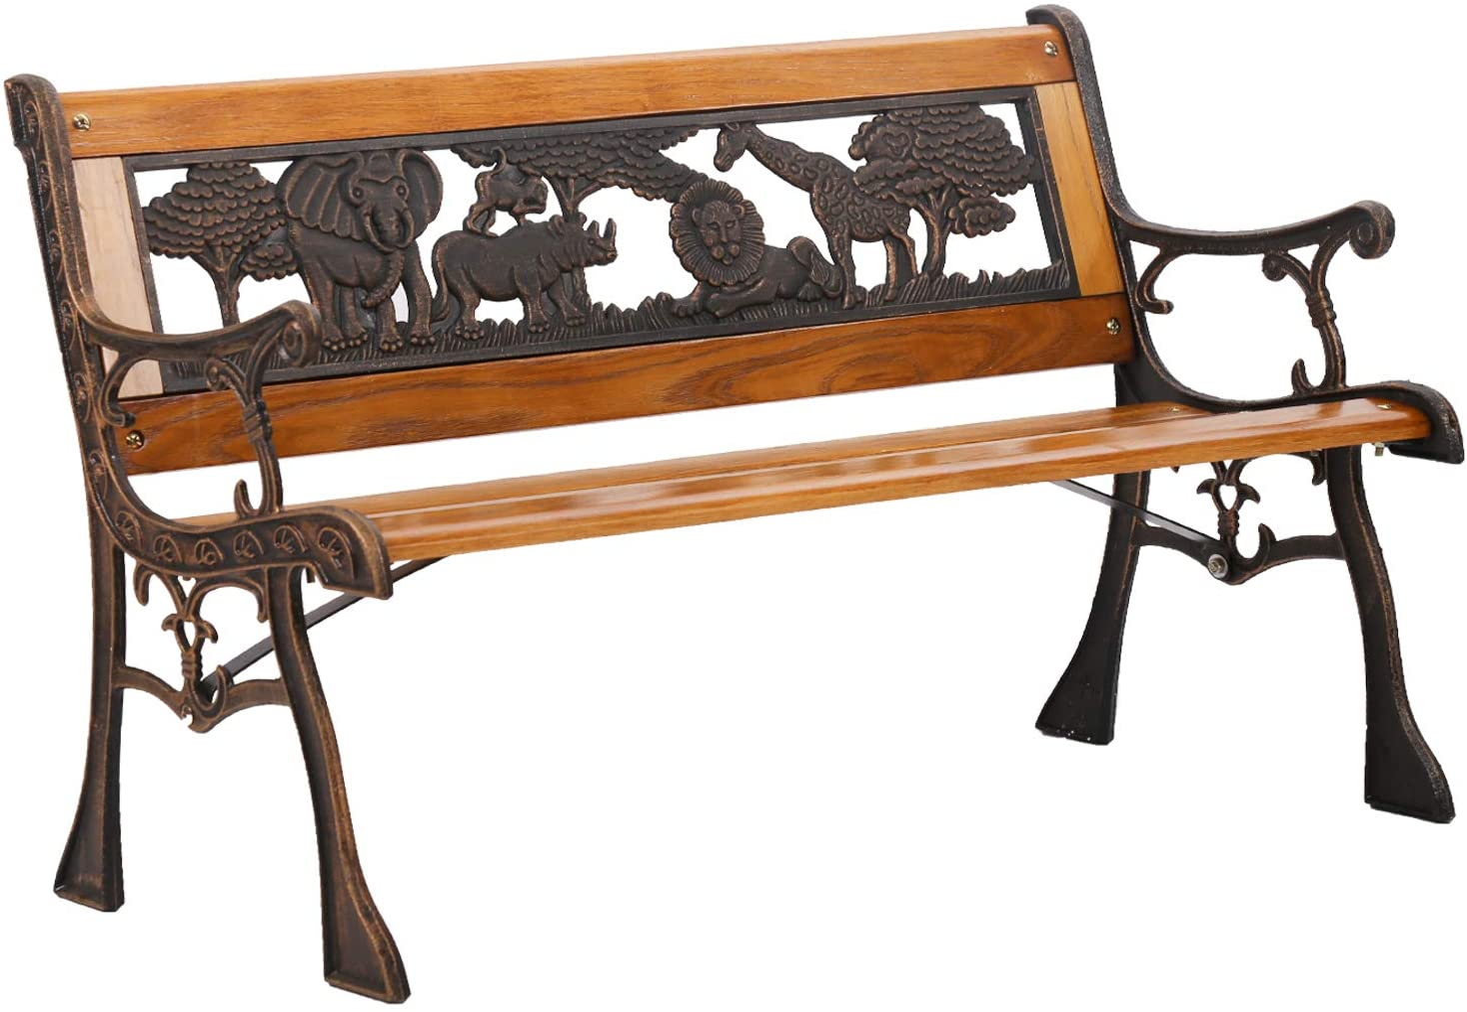 FDW Patio Garden Bench Park Porch Chair with Cast Iron Armrest Hardwood Furniture Animals Child's Bench